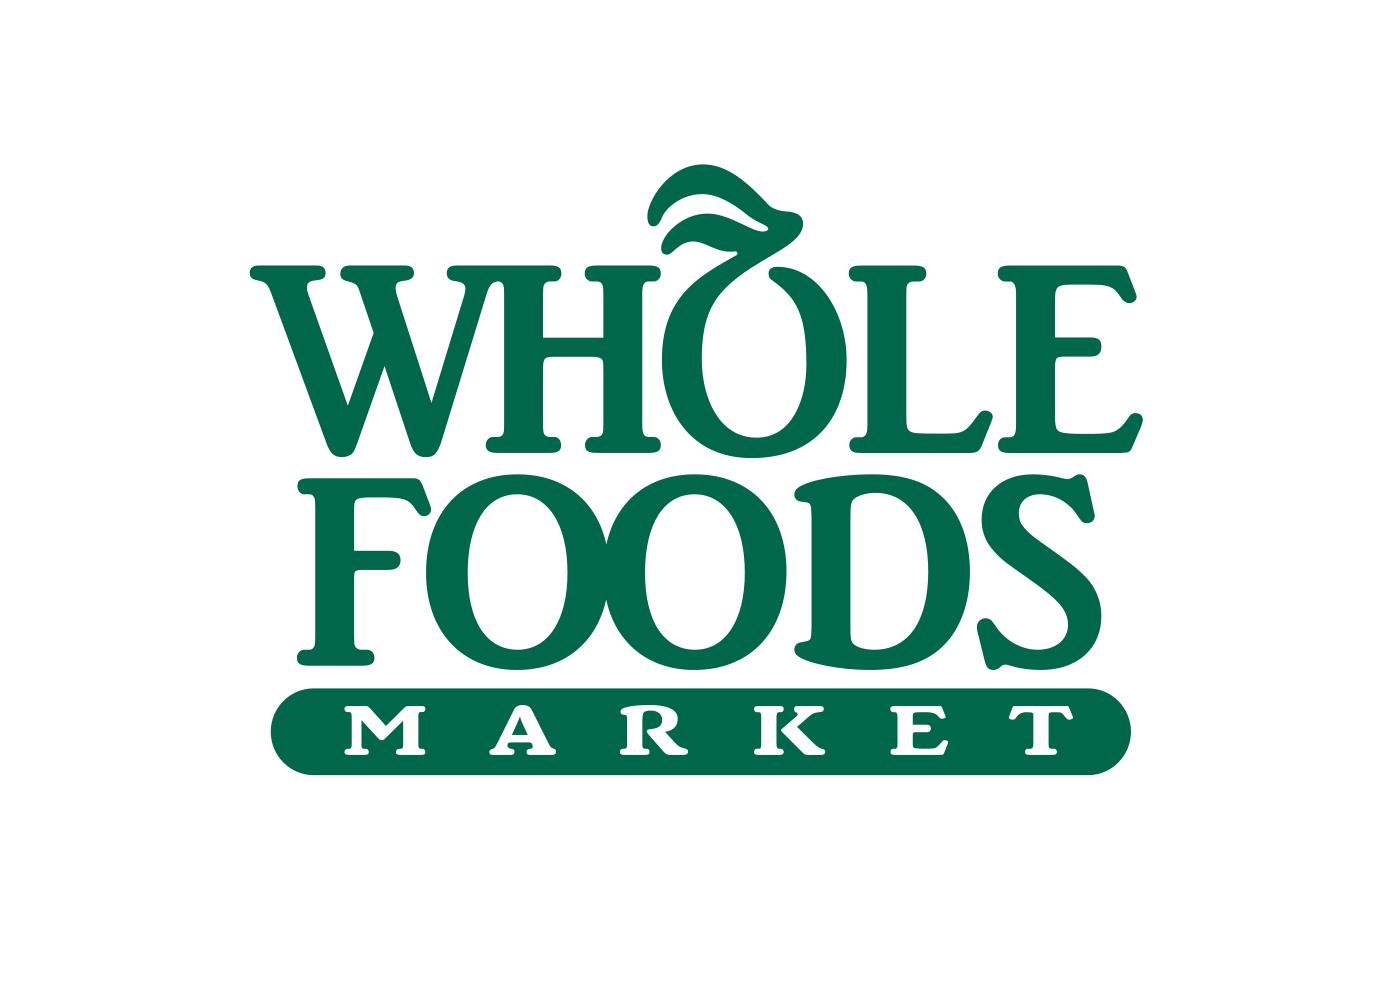 whole-foods-market-logo-2008.png